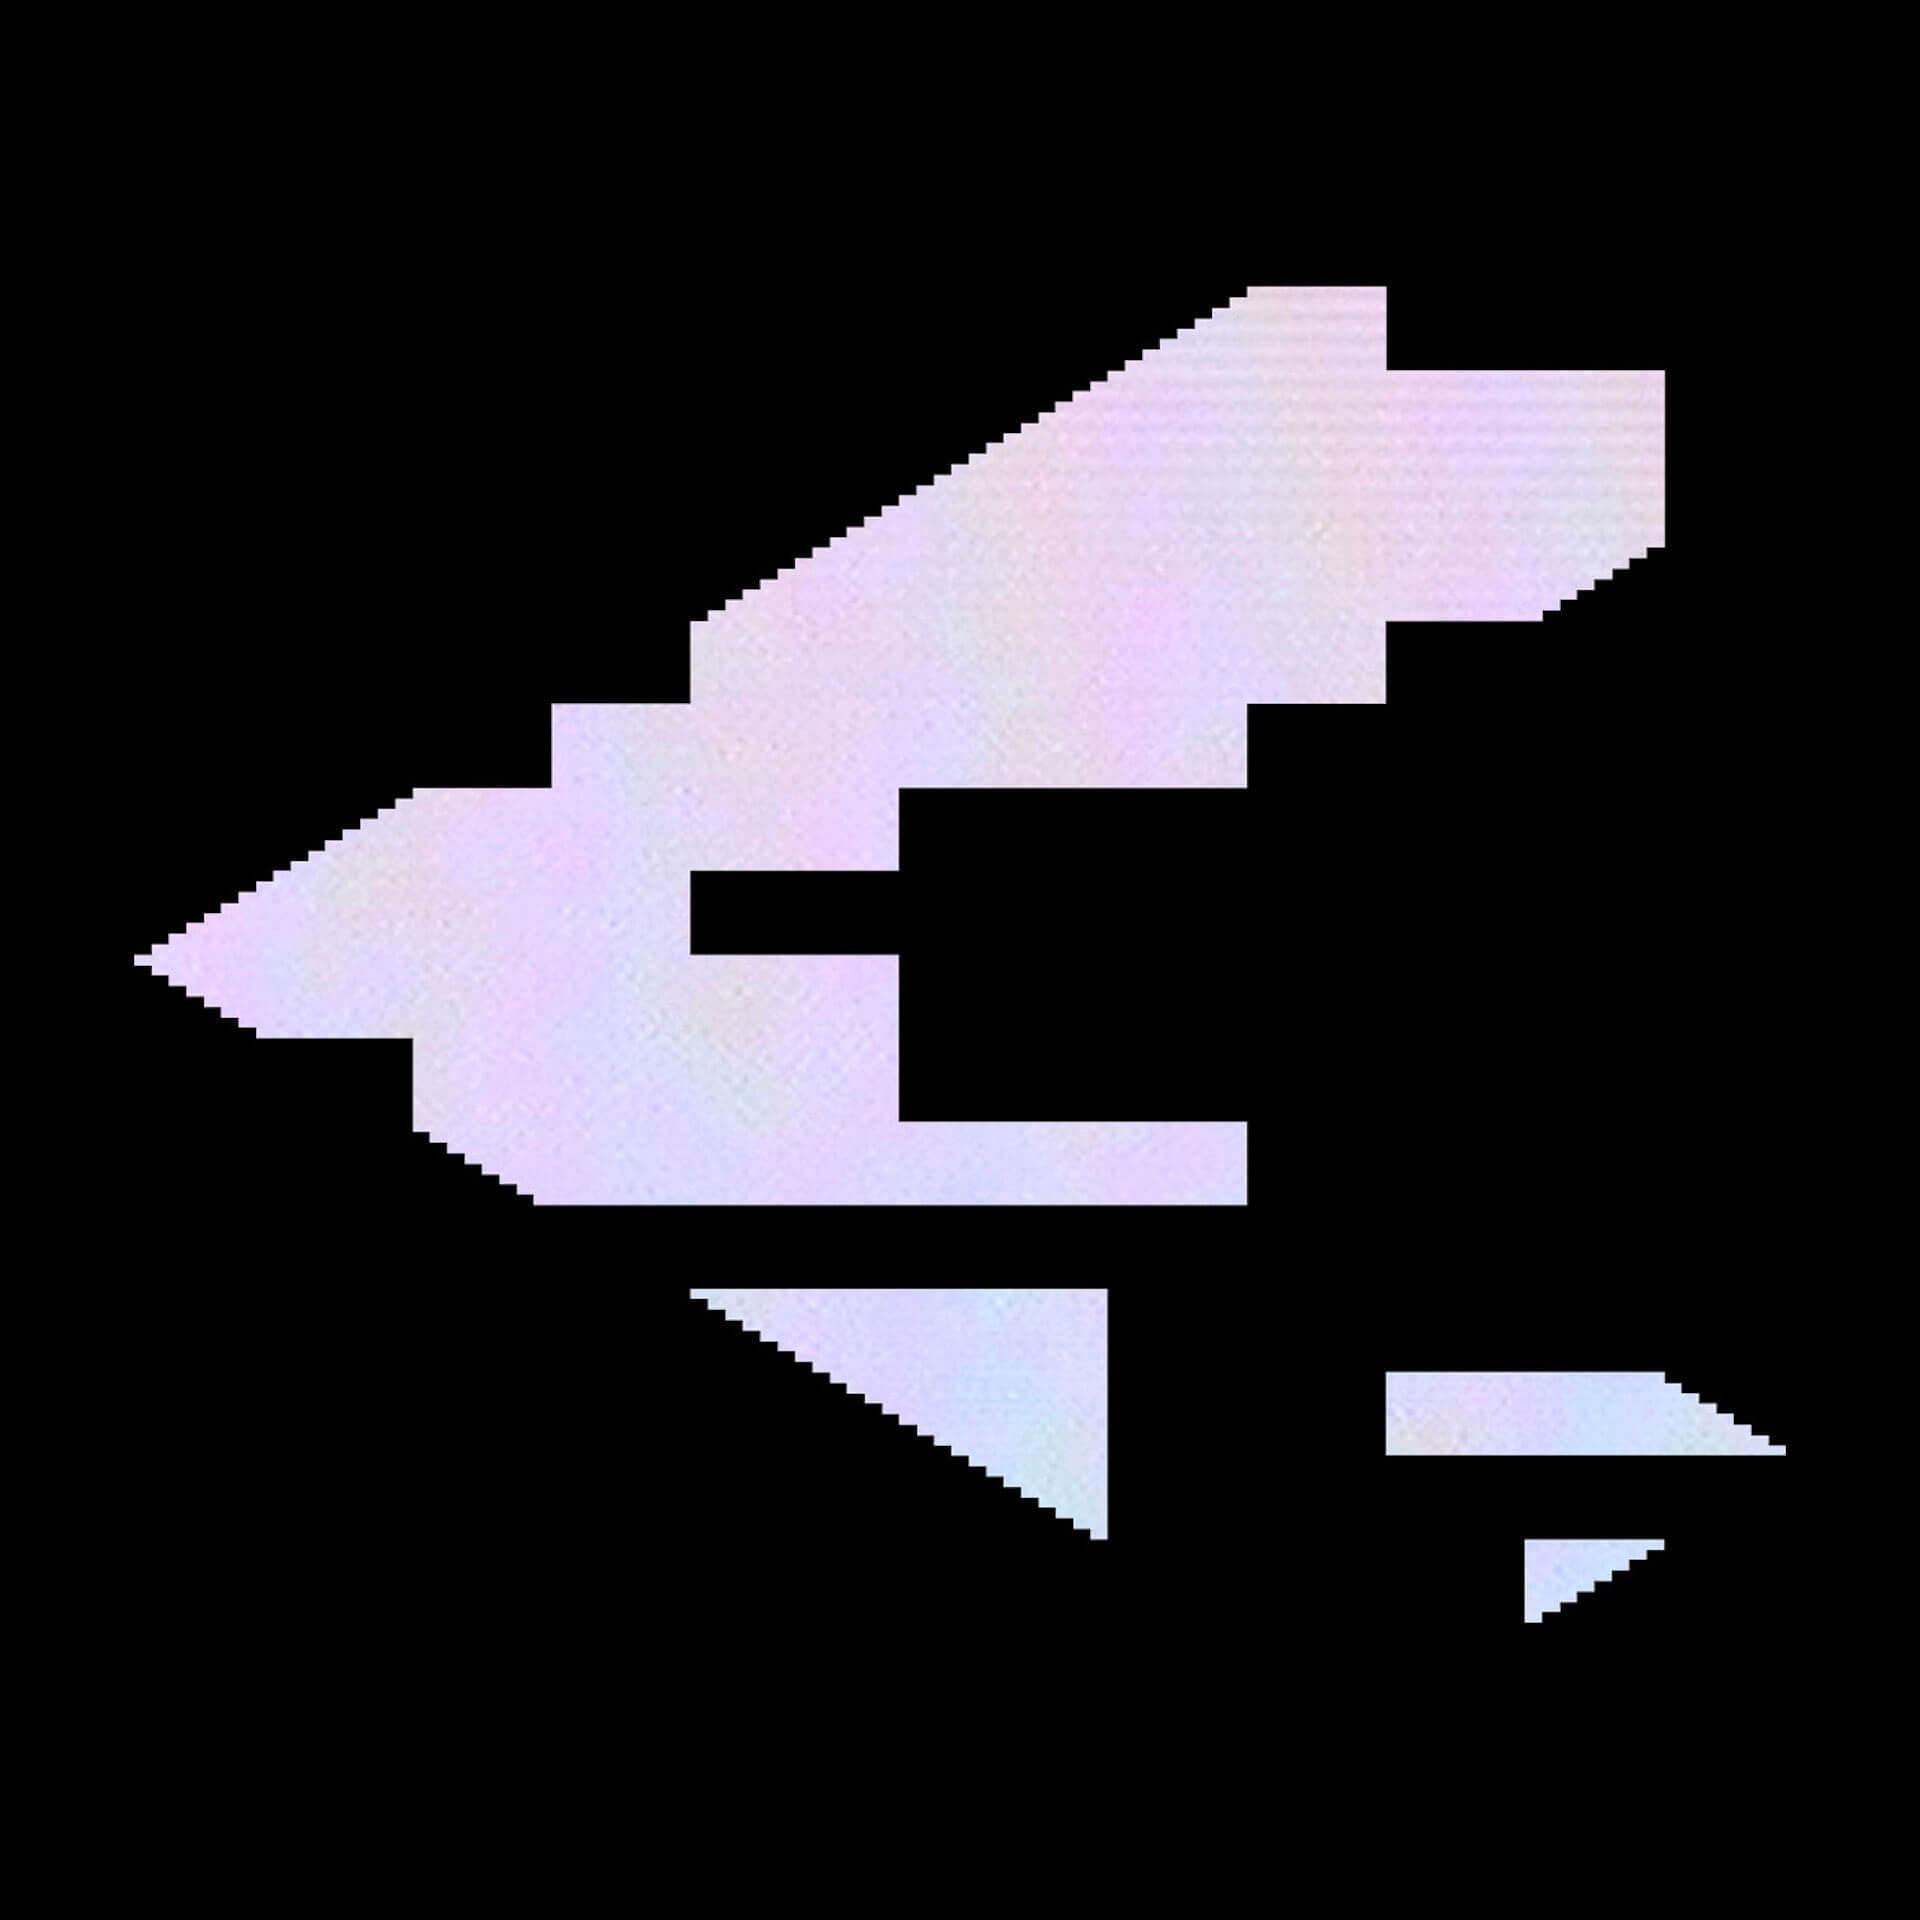 『Be Up A Hello』をリリースしたばかりのスクエアプッシャーが新作『Lamental EP』をリリース!来日公演に真鍋大度が出演決定 music200303_squarepusher_lamental_02